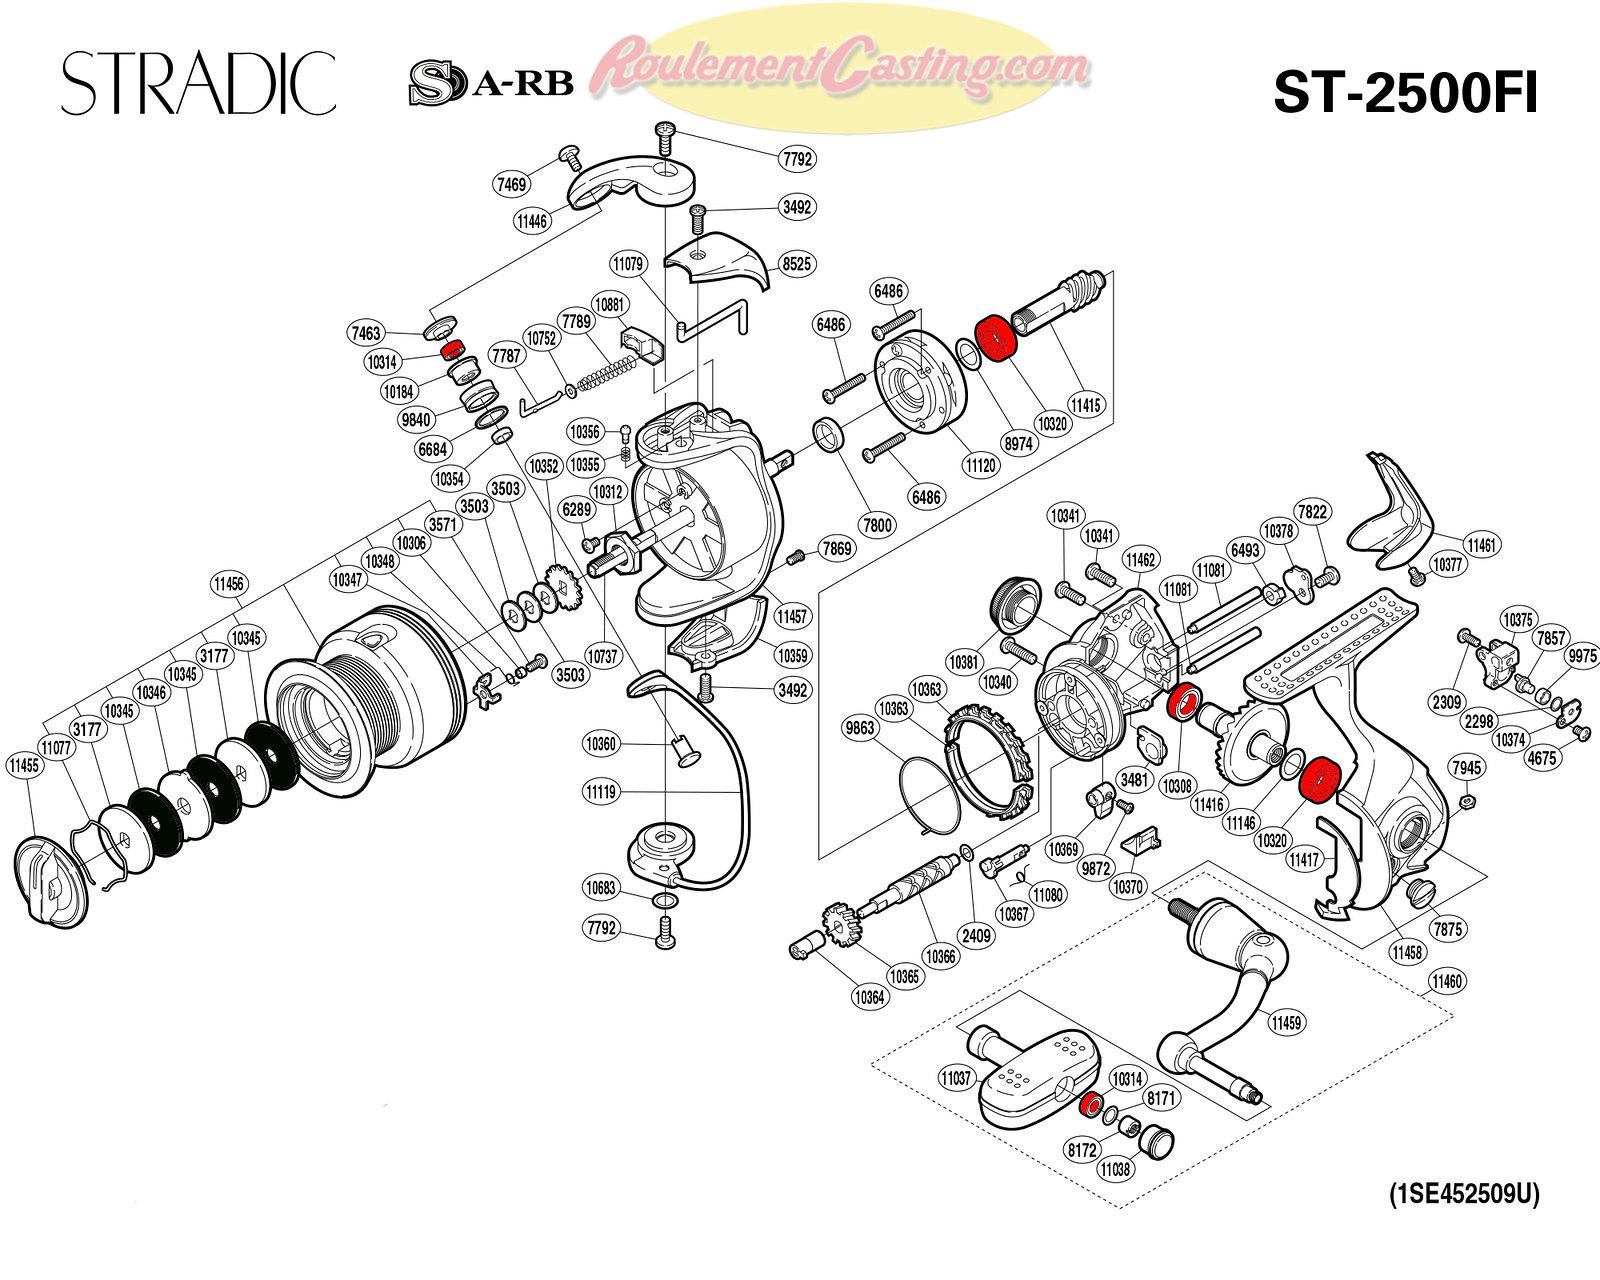 Schema-Stradic-2500FI